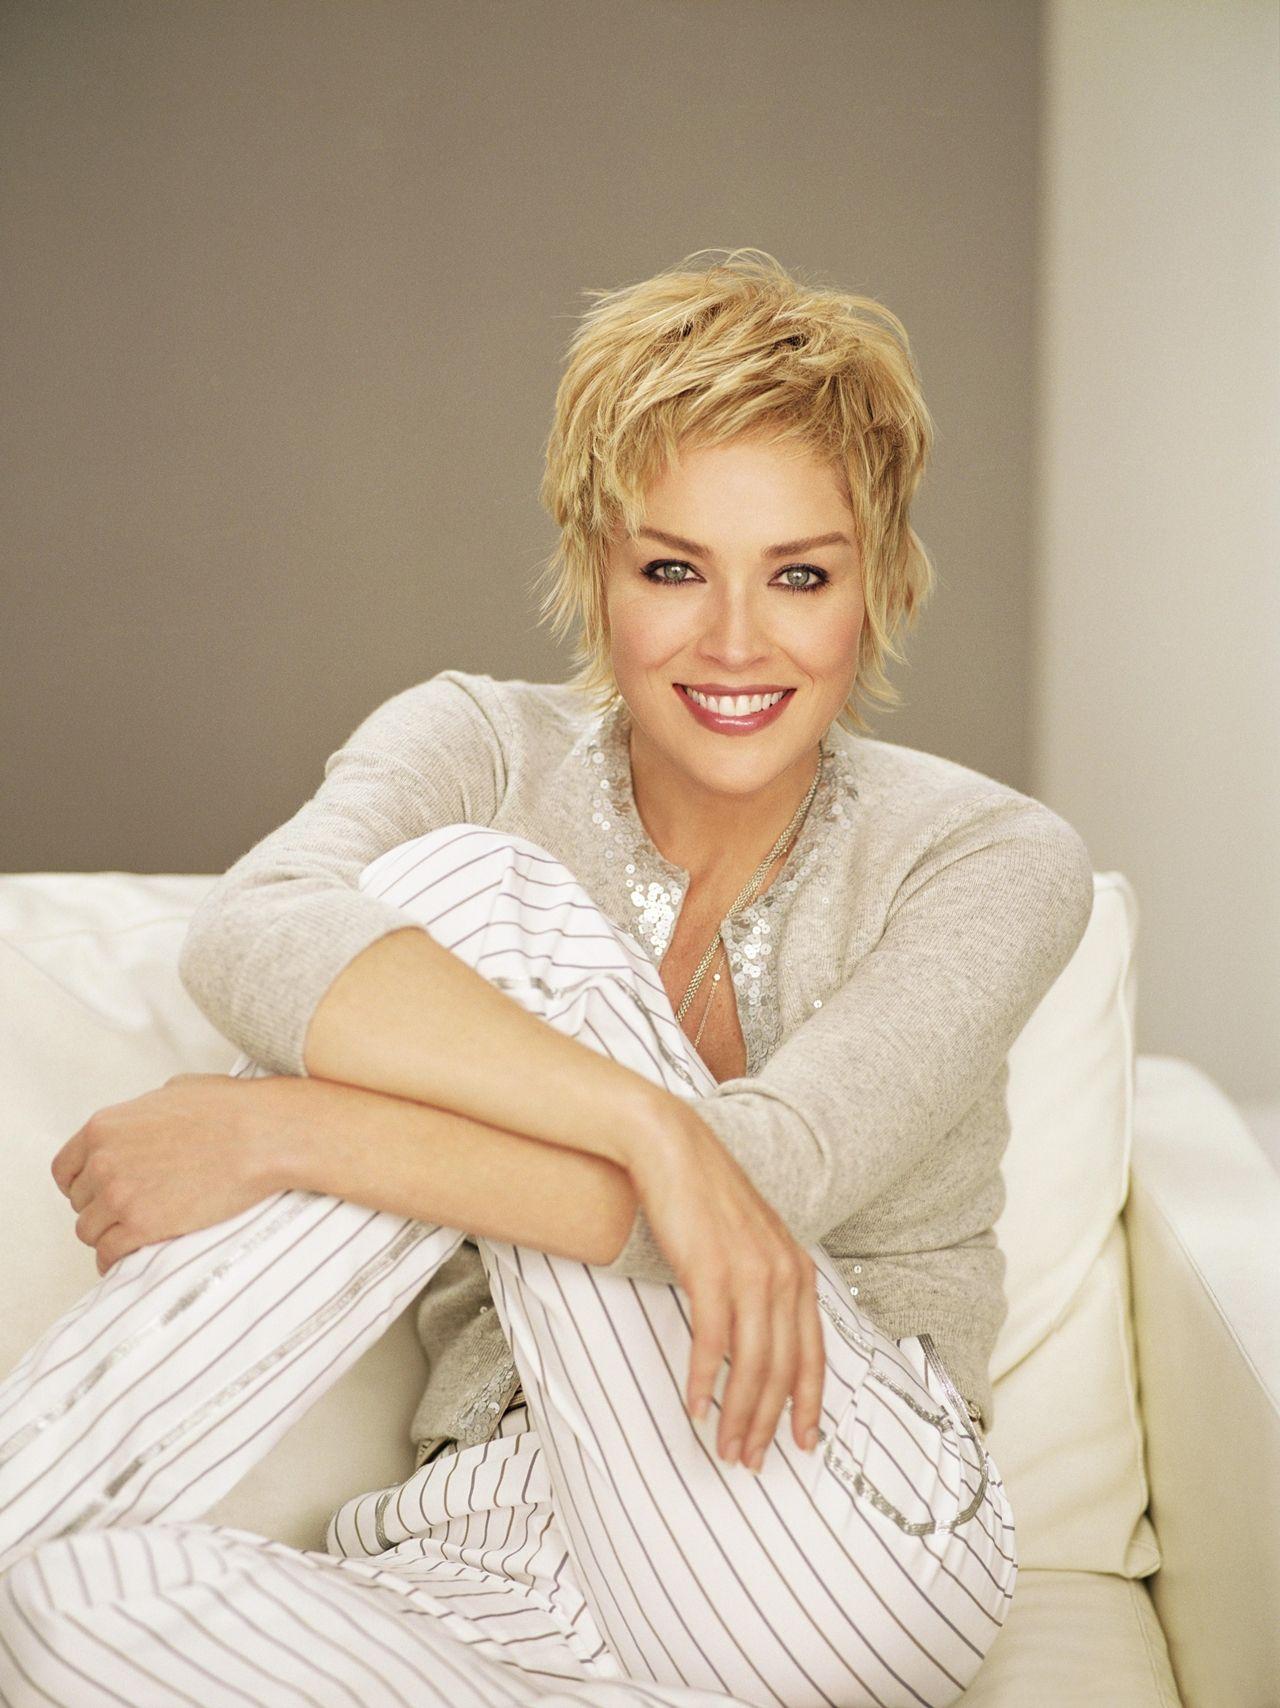 Sharon Stone 07 Favourite Short Hair Cuts Pinterest Frisuren